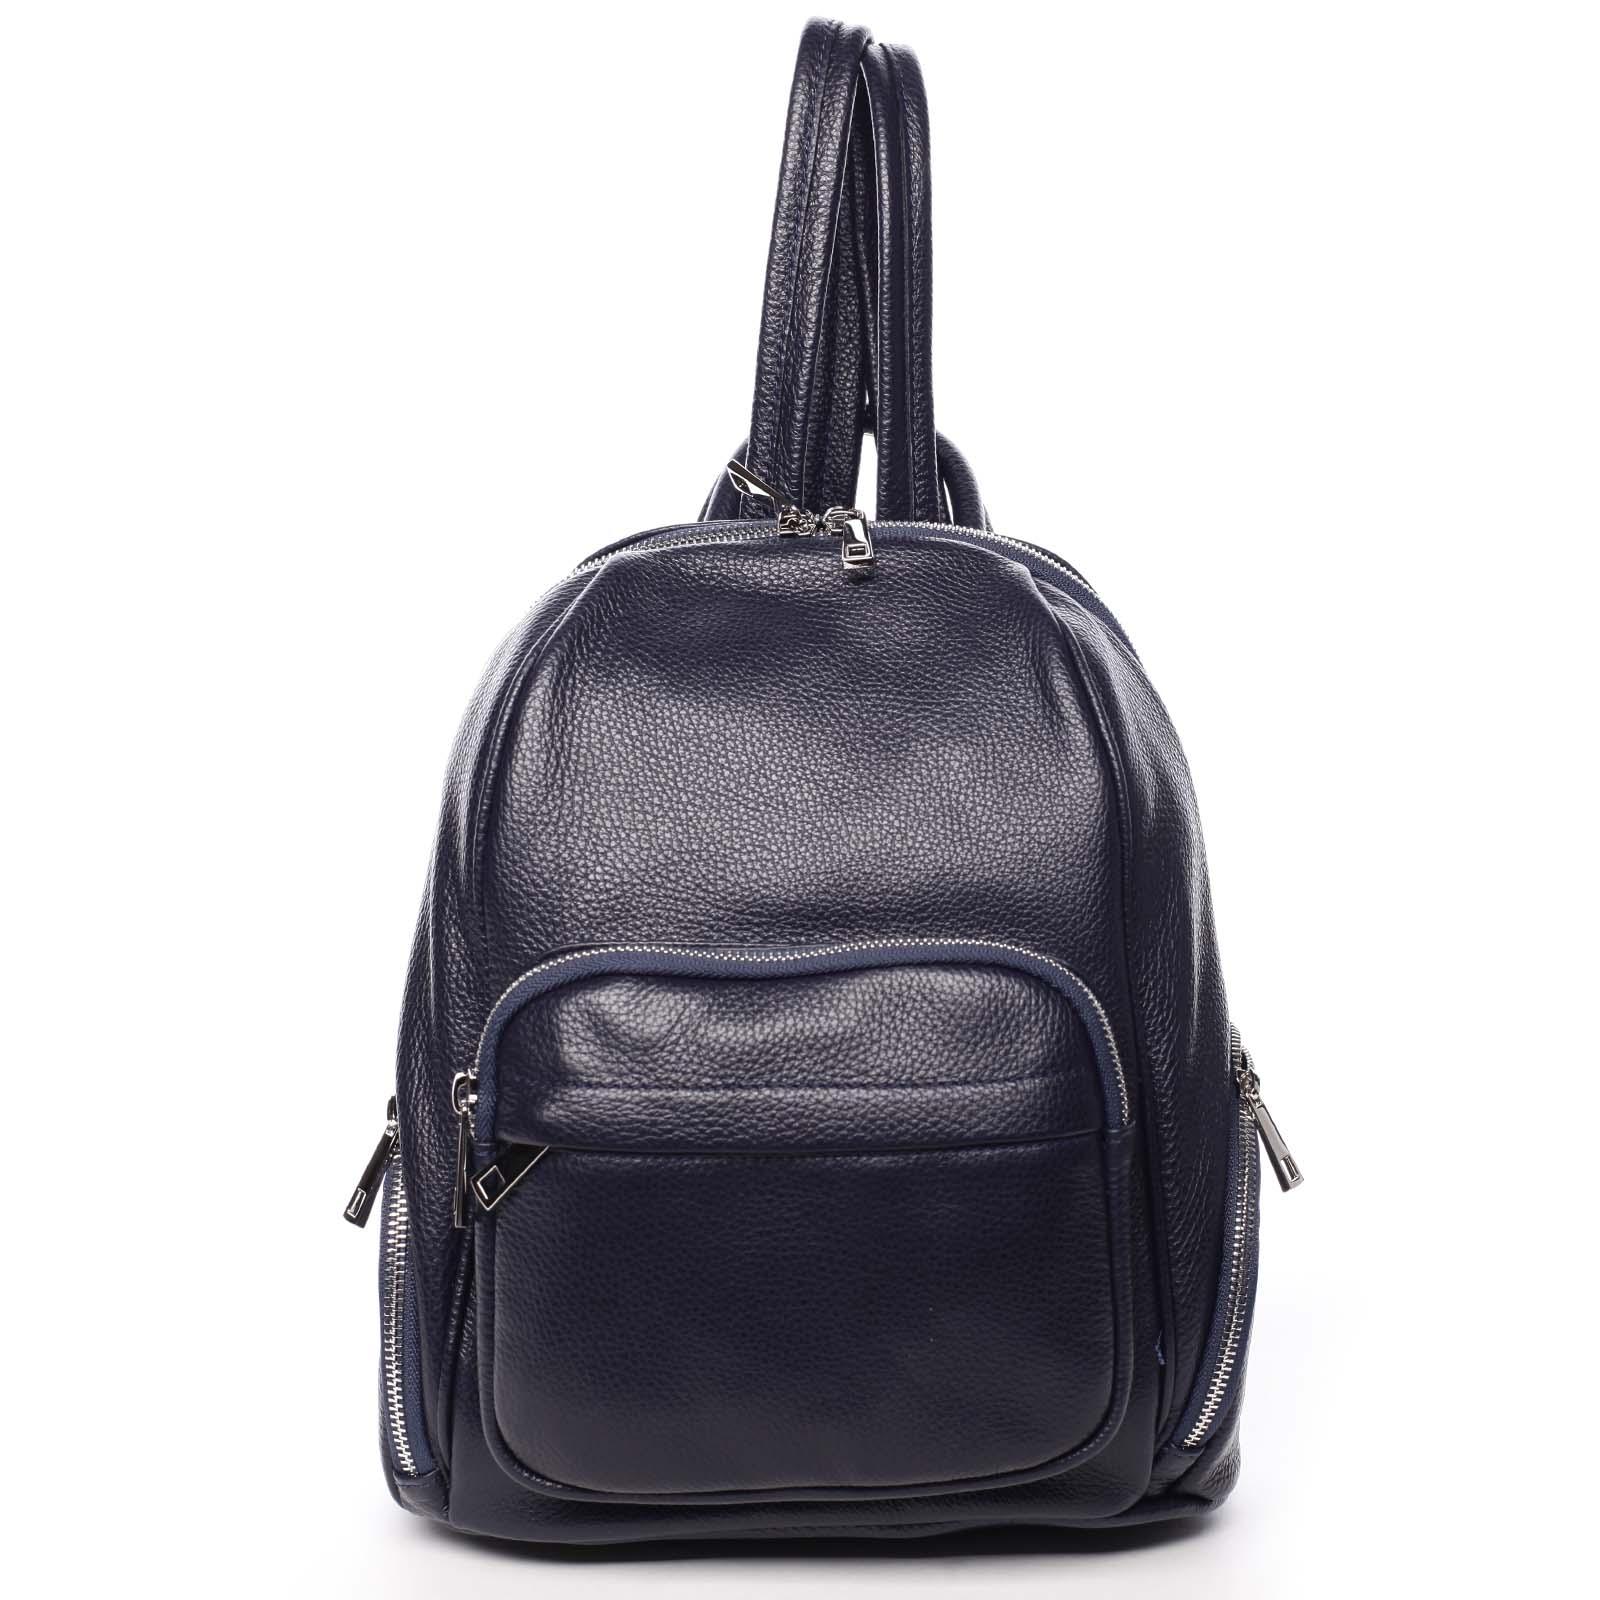 Dámský kožený batoh tmavě modrý - ItalY Minetta